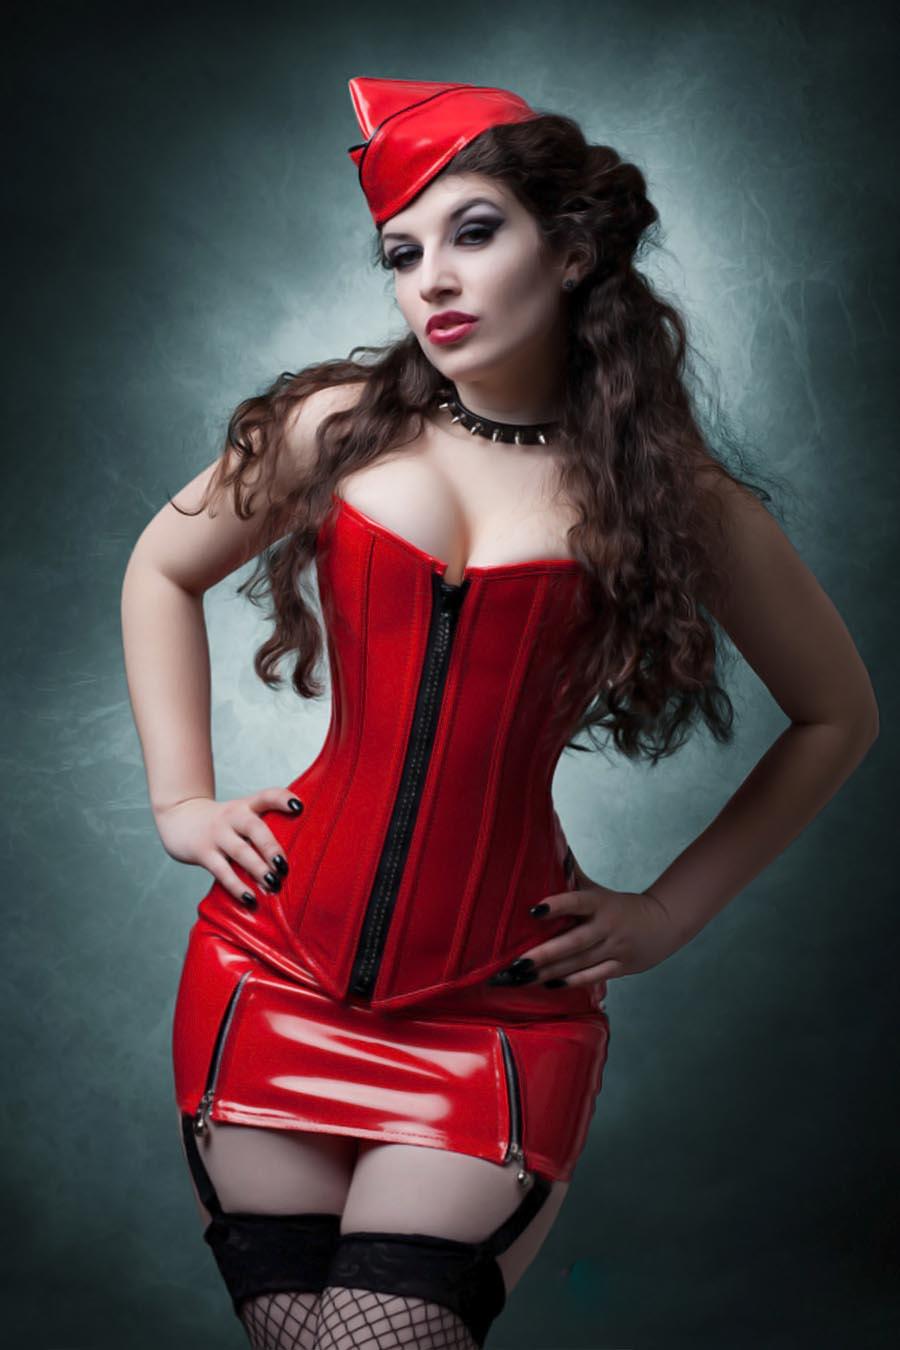 sexy+tight+corset+(30).jpg